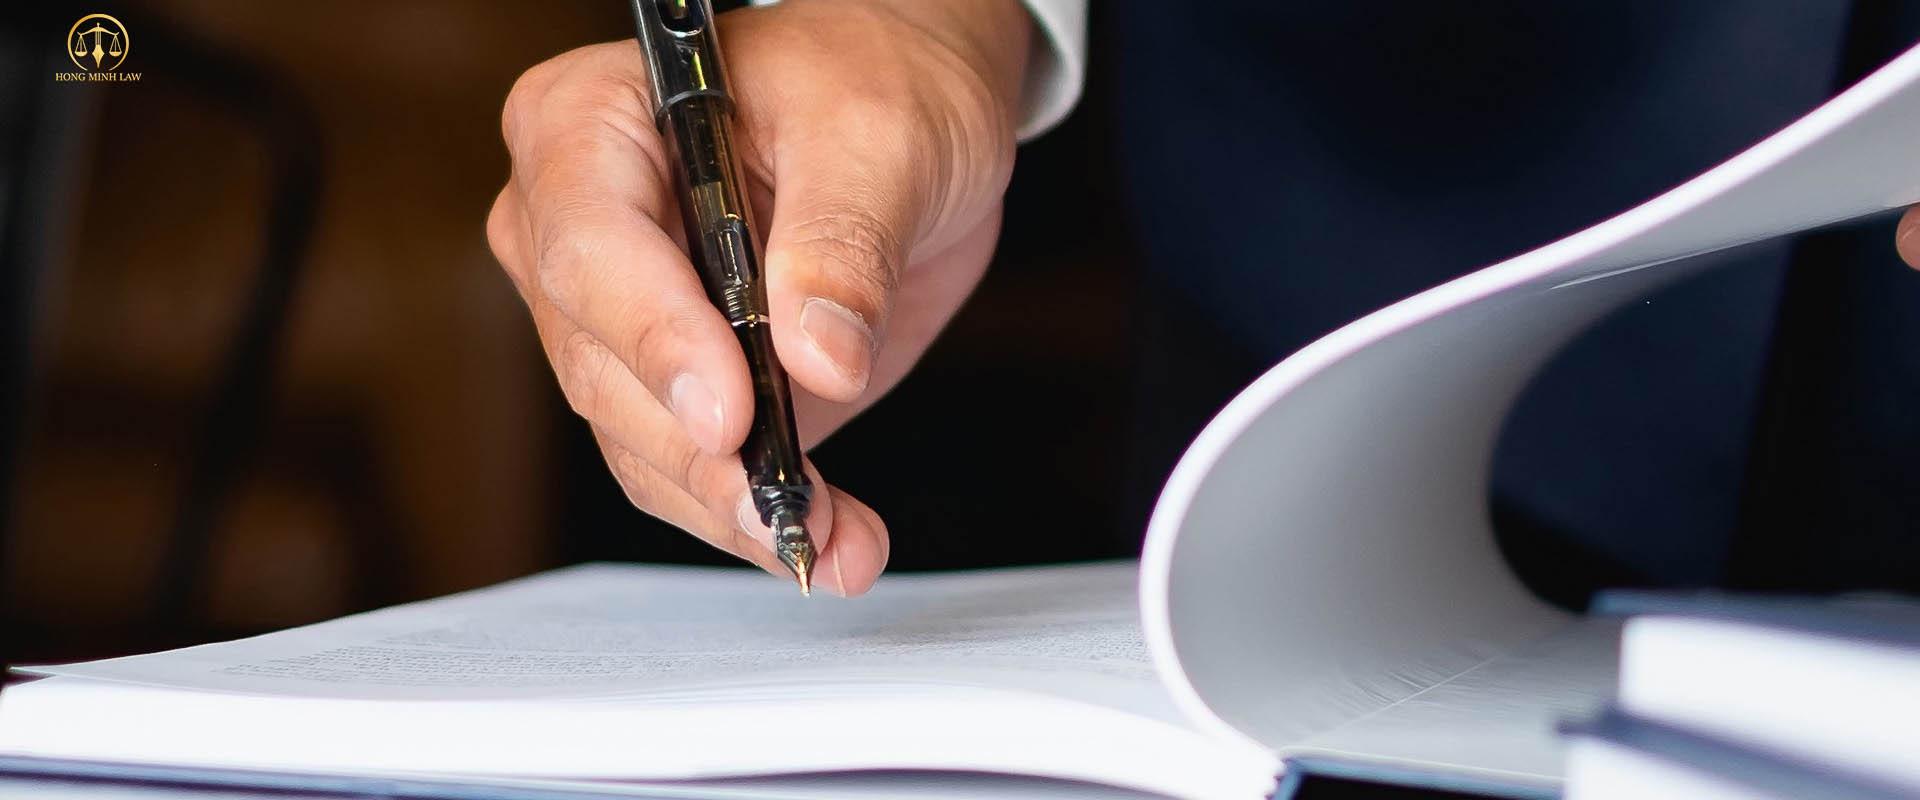 Thủ tục cấp giấy chứng nhận kinh doanh gạo